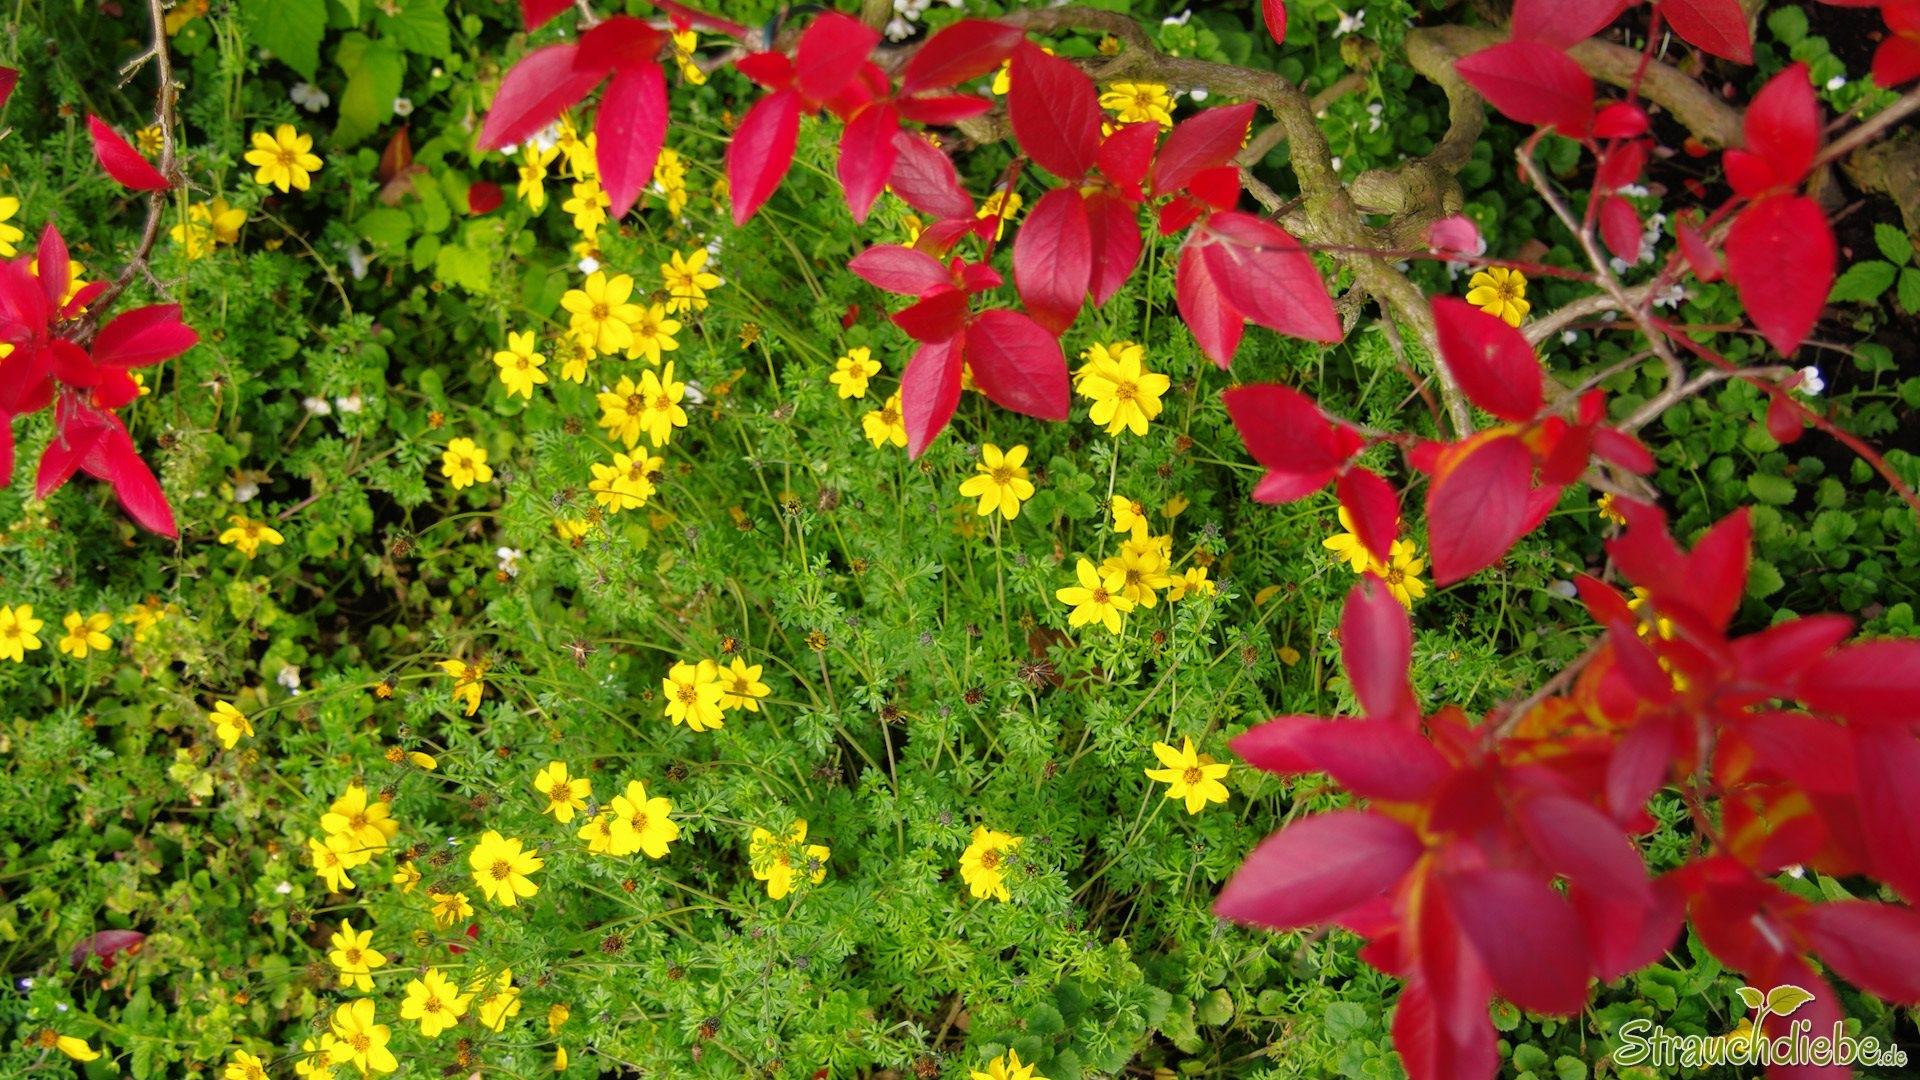 Goldzweizahn (Bidens ferulifolia)